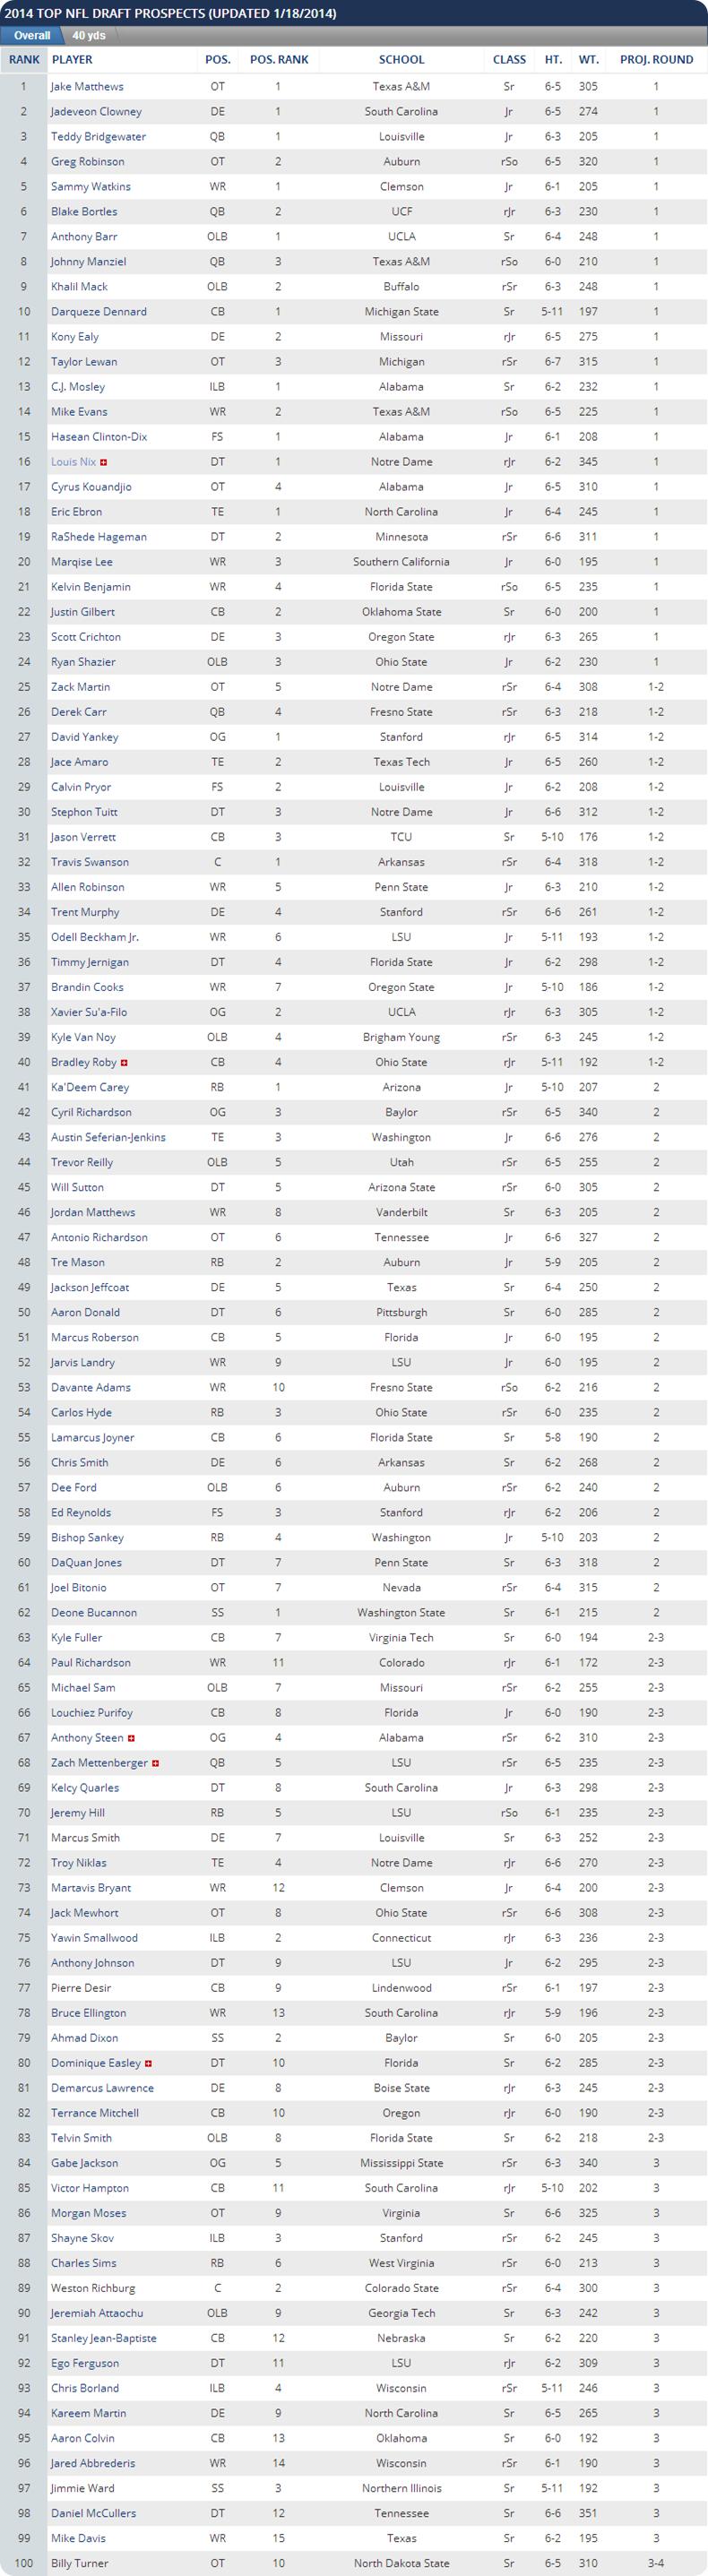 NFL Draft Prospects 2014 - 2014 NFL Draft Prospects - Dallas Cowboys Draft 2014 - 2014 Dallas Cowboys Draft - Updated 01-18-2014